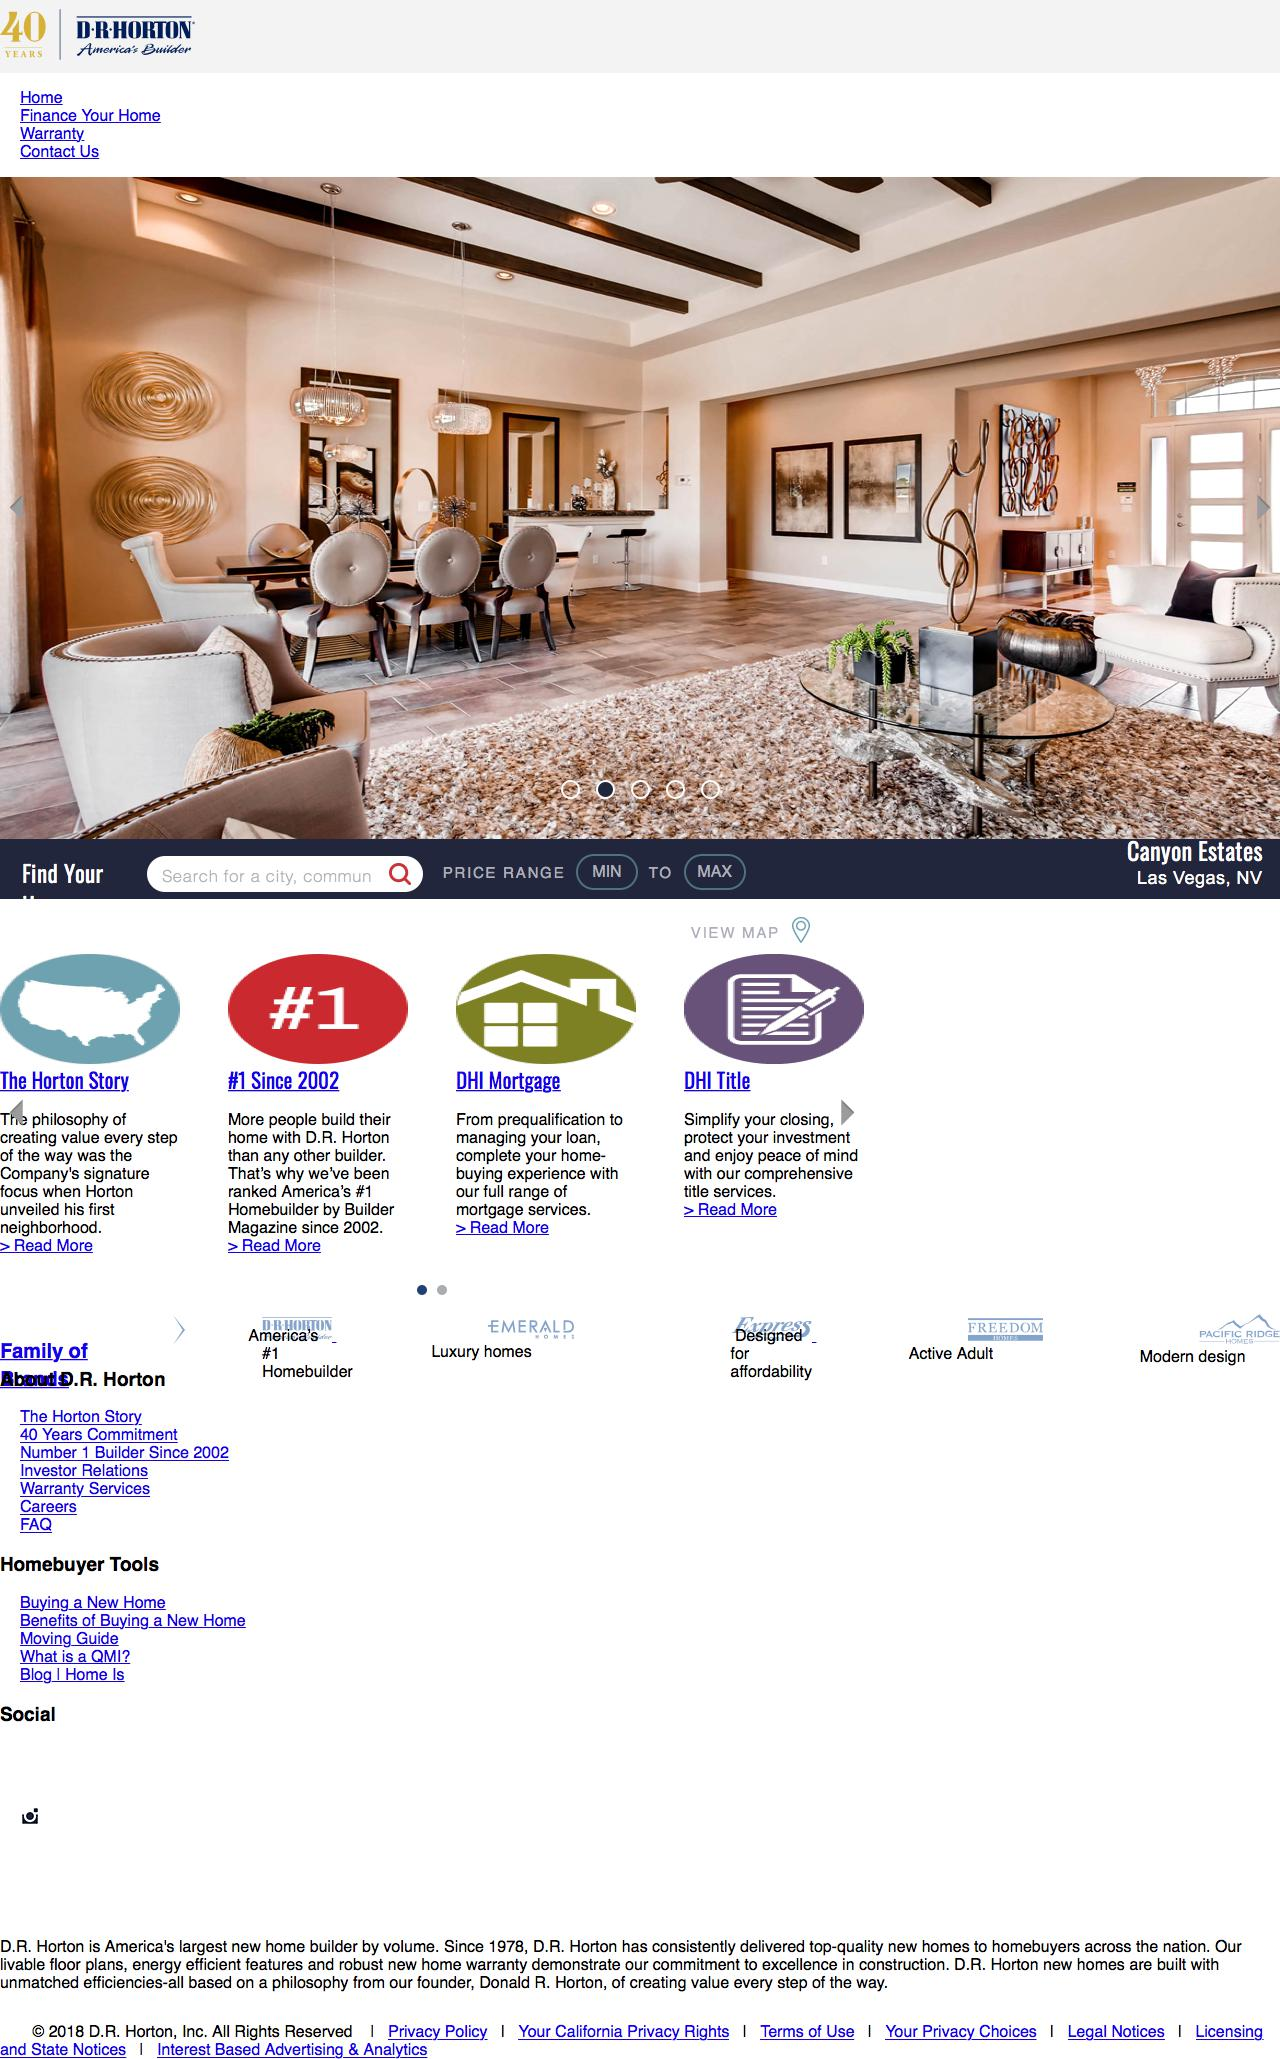 Screenshot of drhorton.com - America's Largest Home Builder | D.R. Horton - captured June 26, 2018